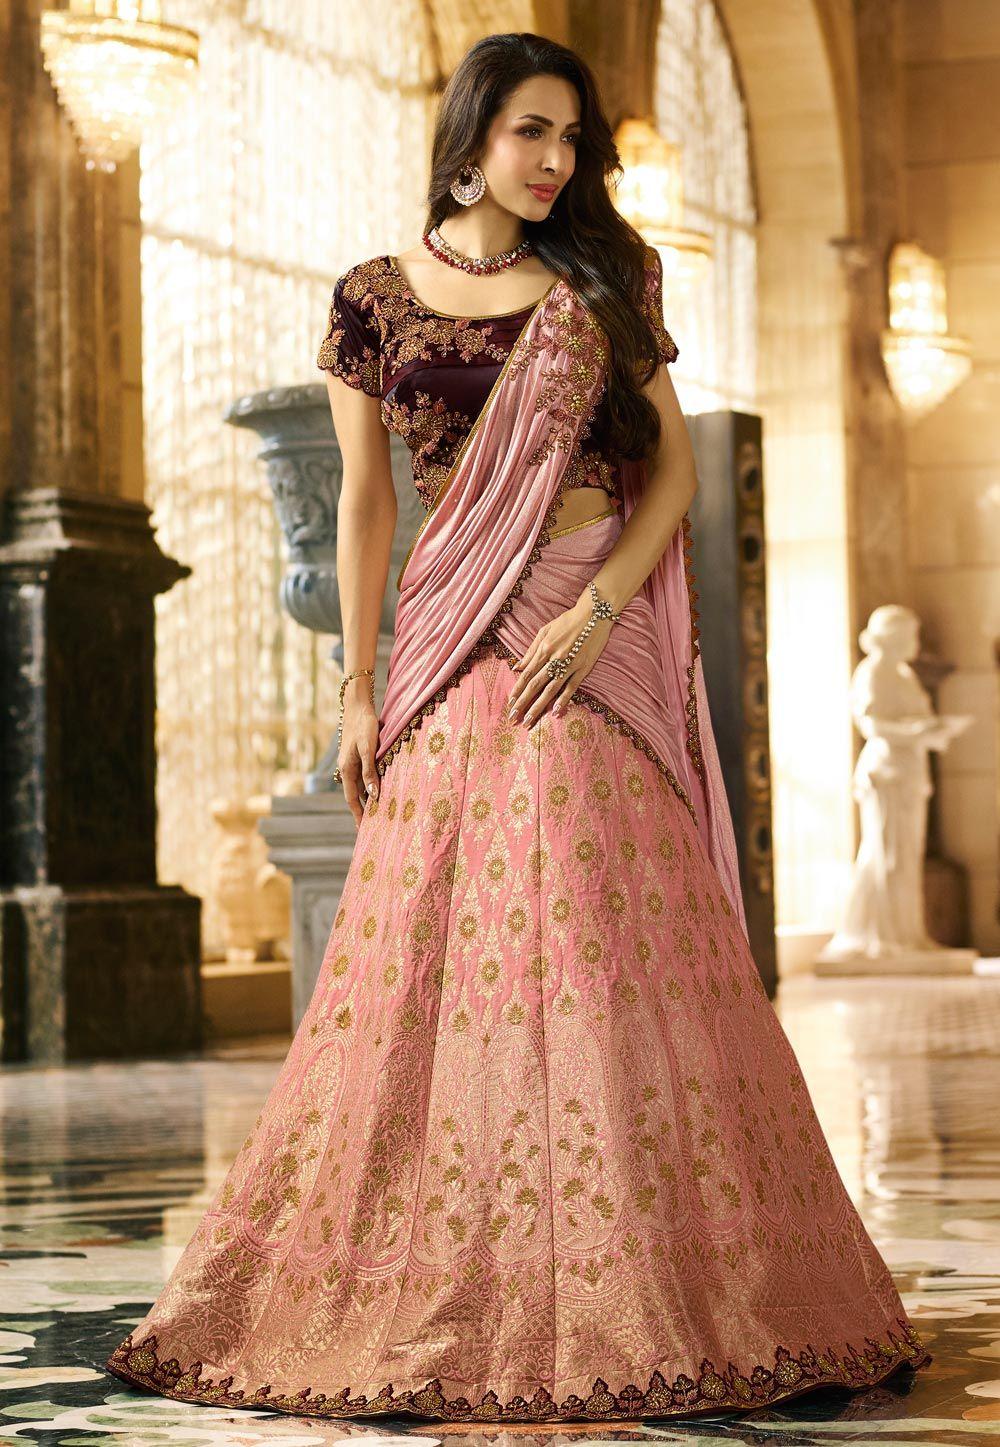 caa5676f4f Buy Malaika Arora Light Pink Banarasi Silk Bollywood Lehenga Choli 153908  online at best price from vast collection of Lehenga Choli and Chaniya Choli  at ...